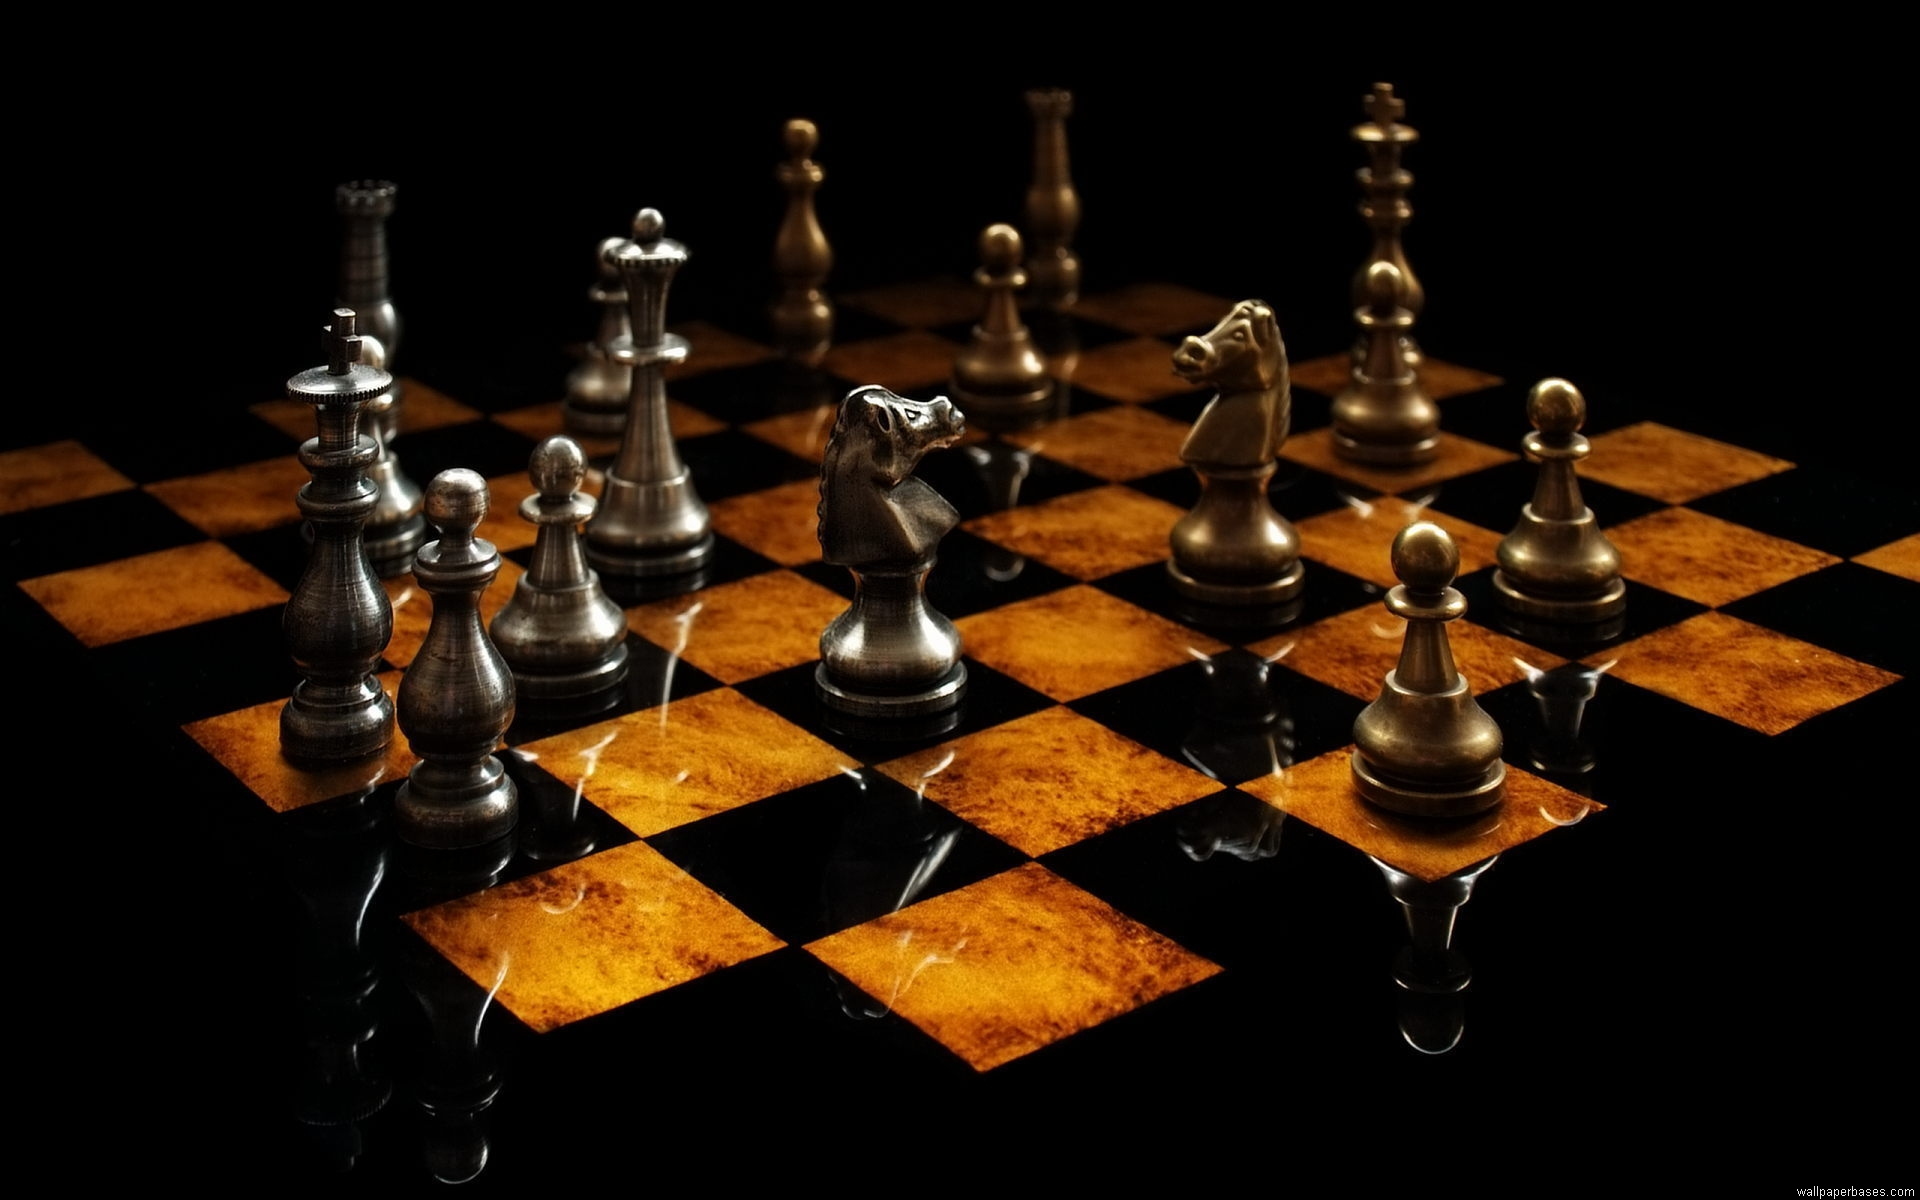 Hd Wallpapers 5 Best Hd Wallpapers Hd Widescreen Chess